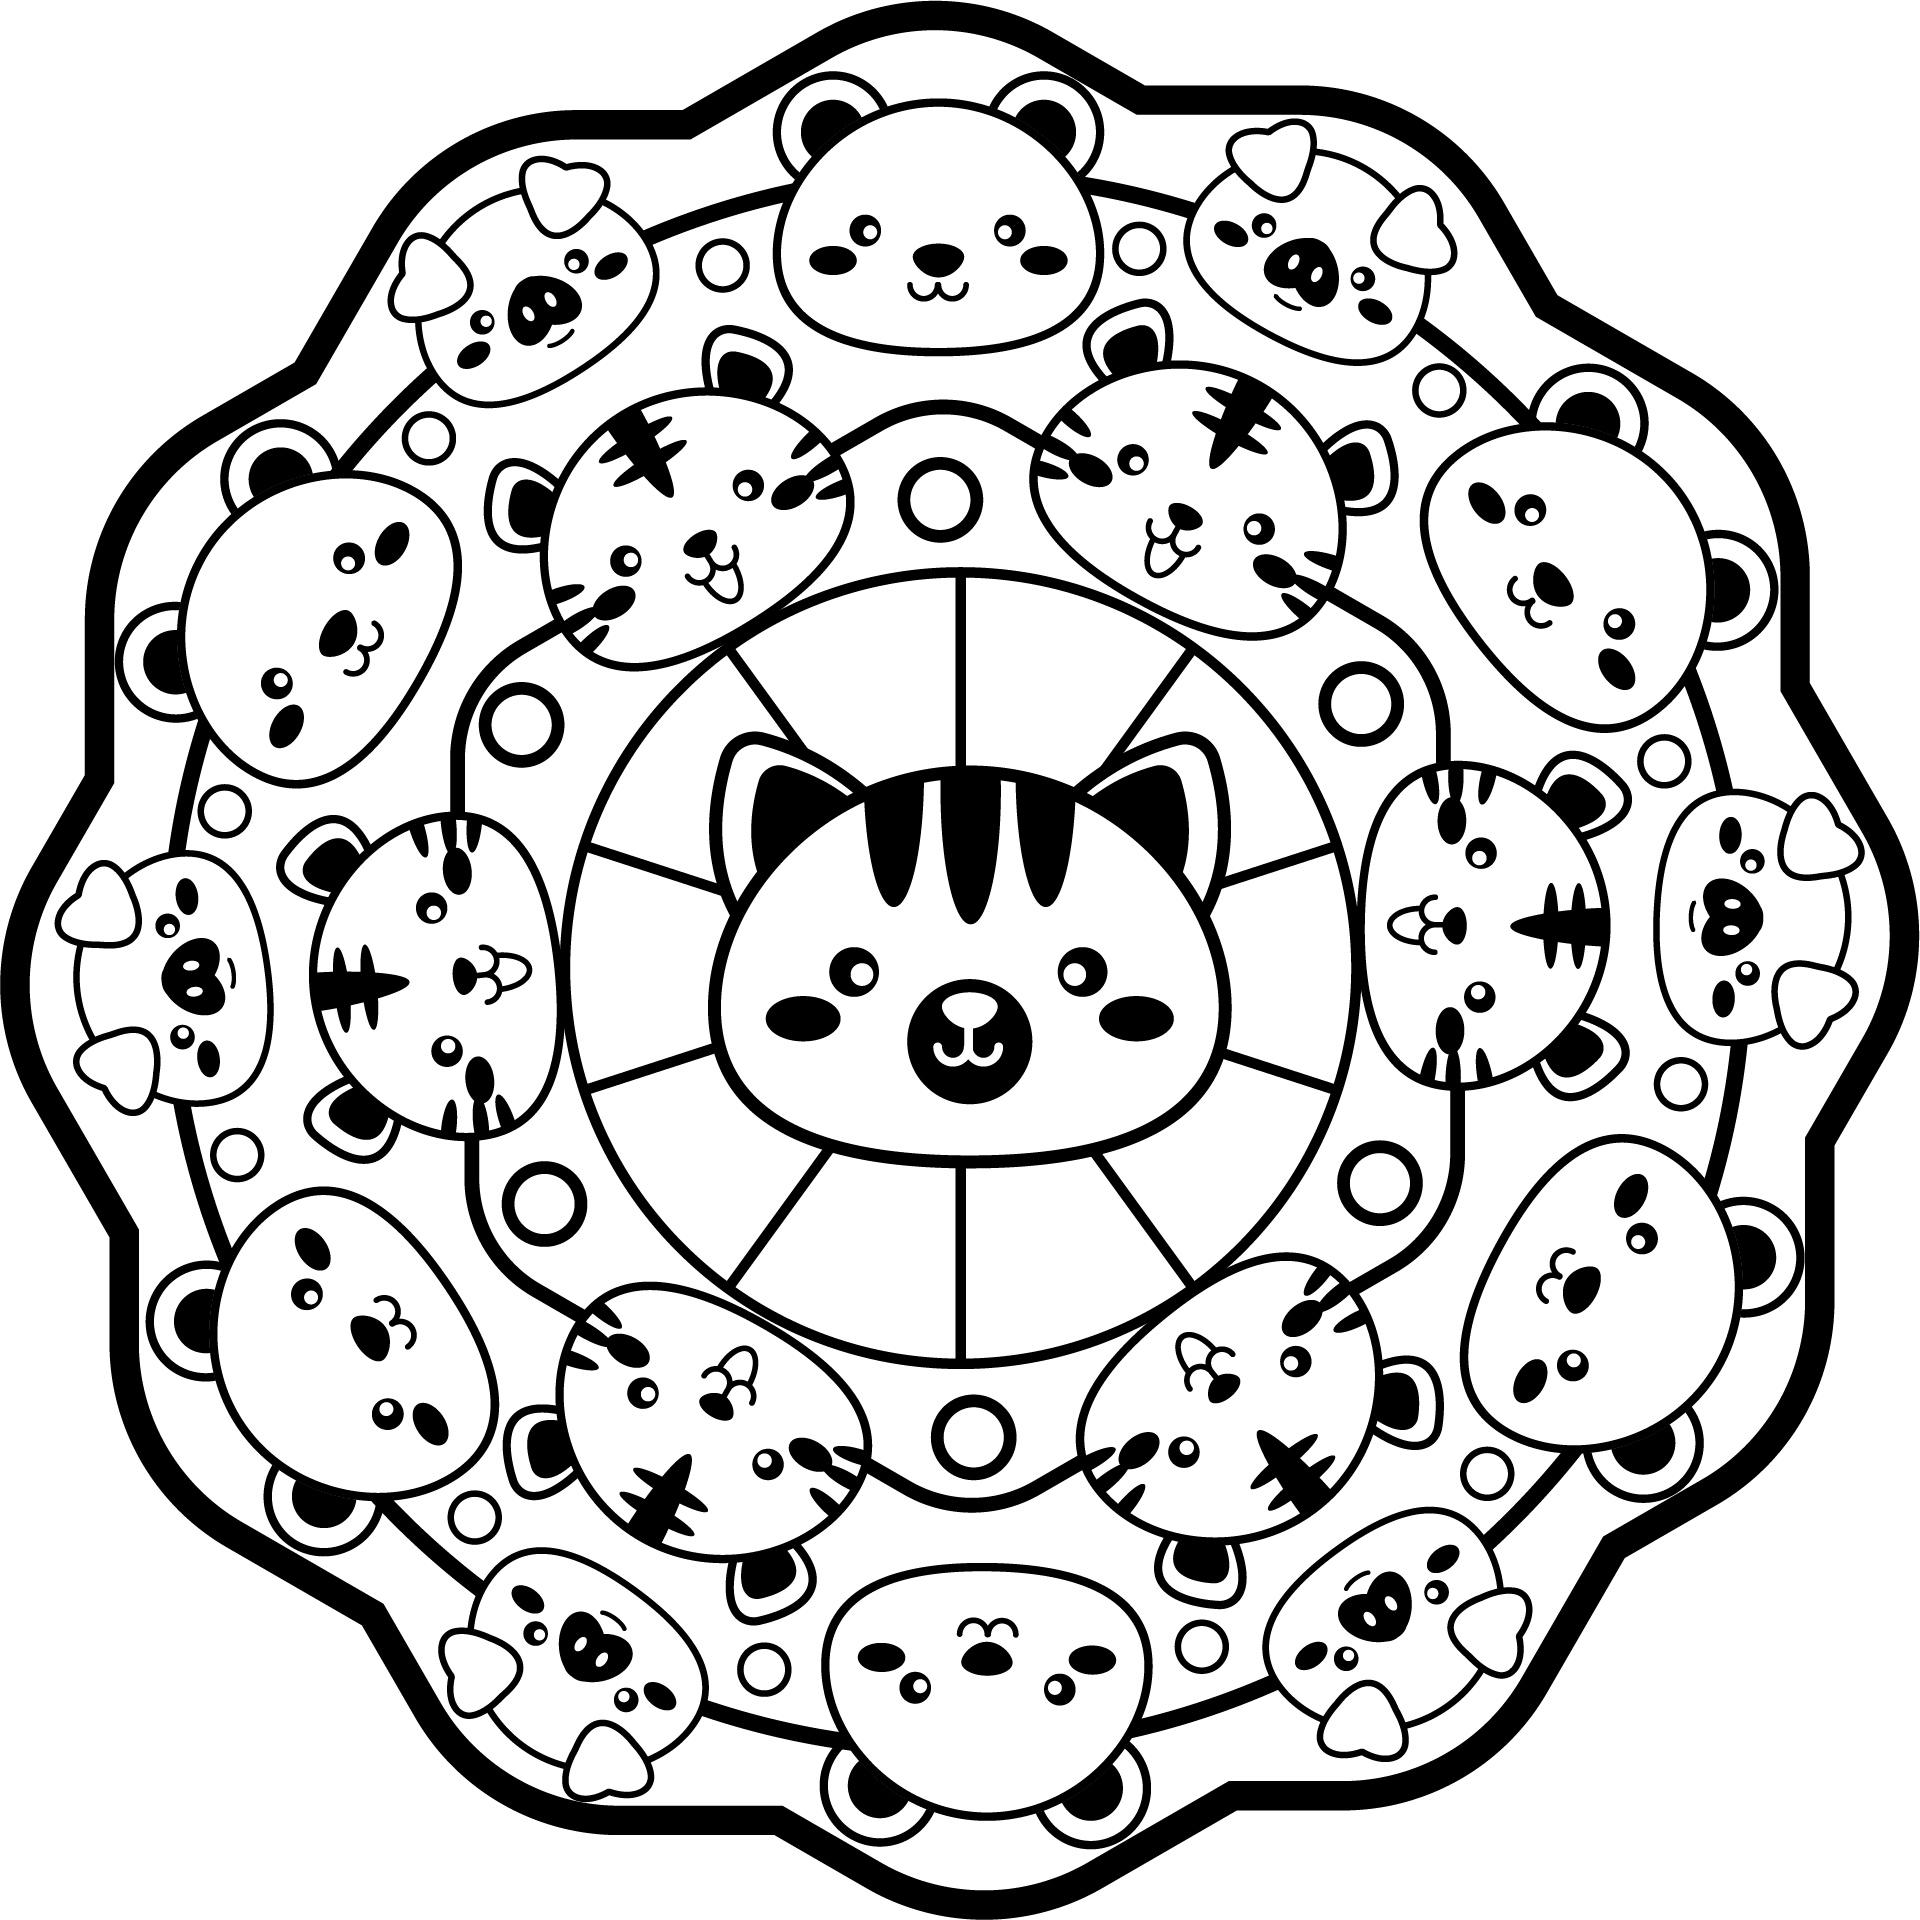 Mandala de Animales del Zoo 1 • IMPRIME MANDALAS